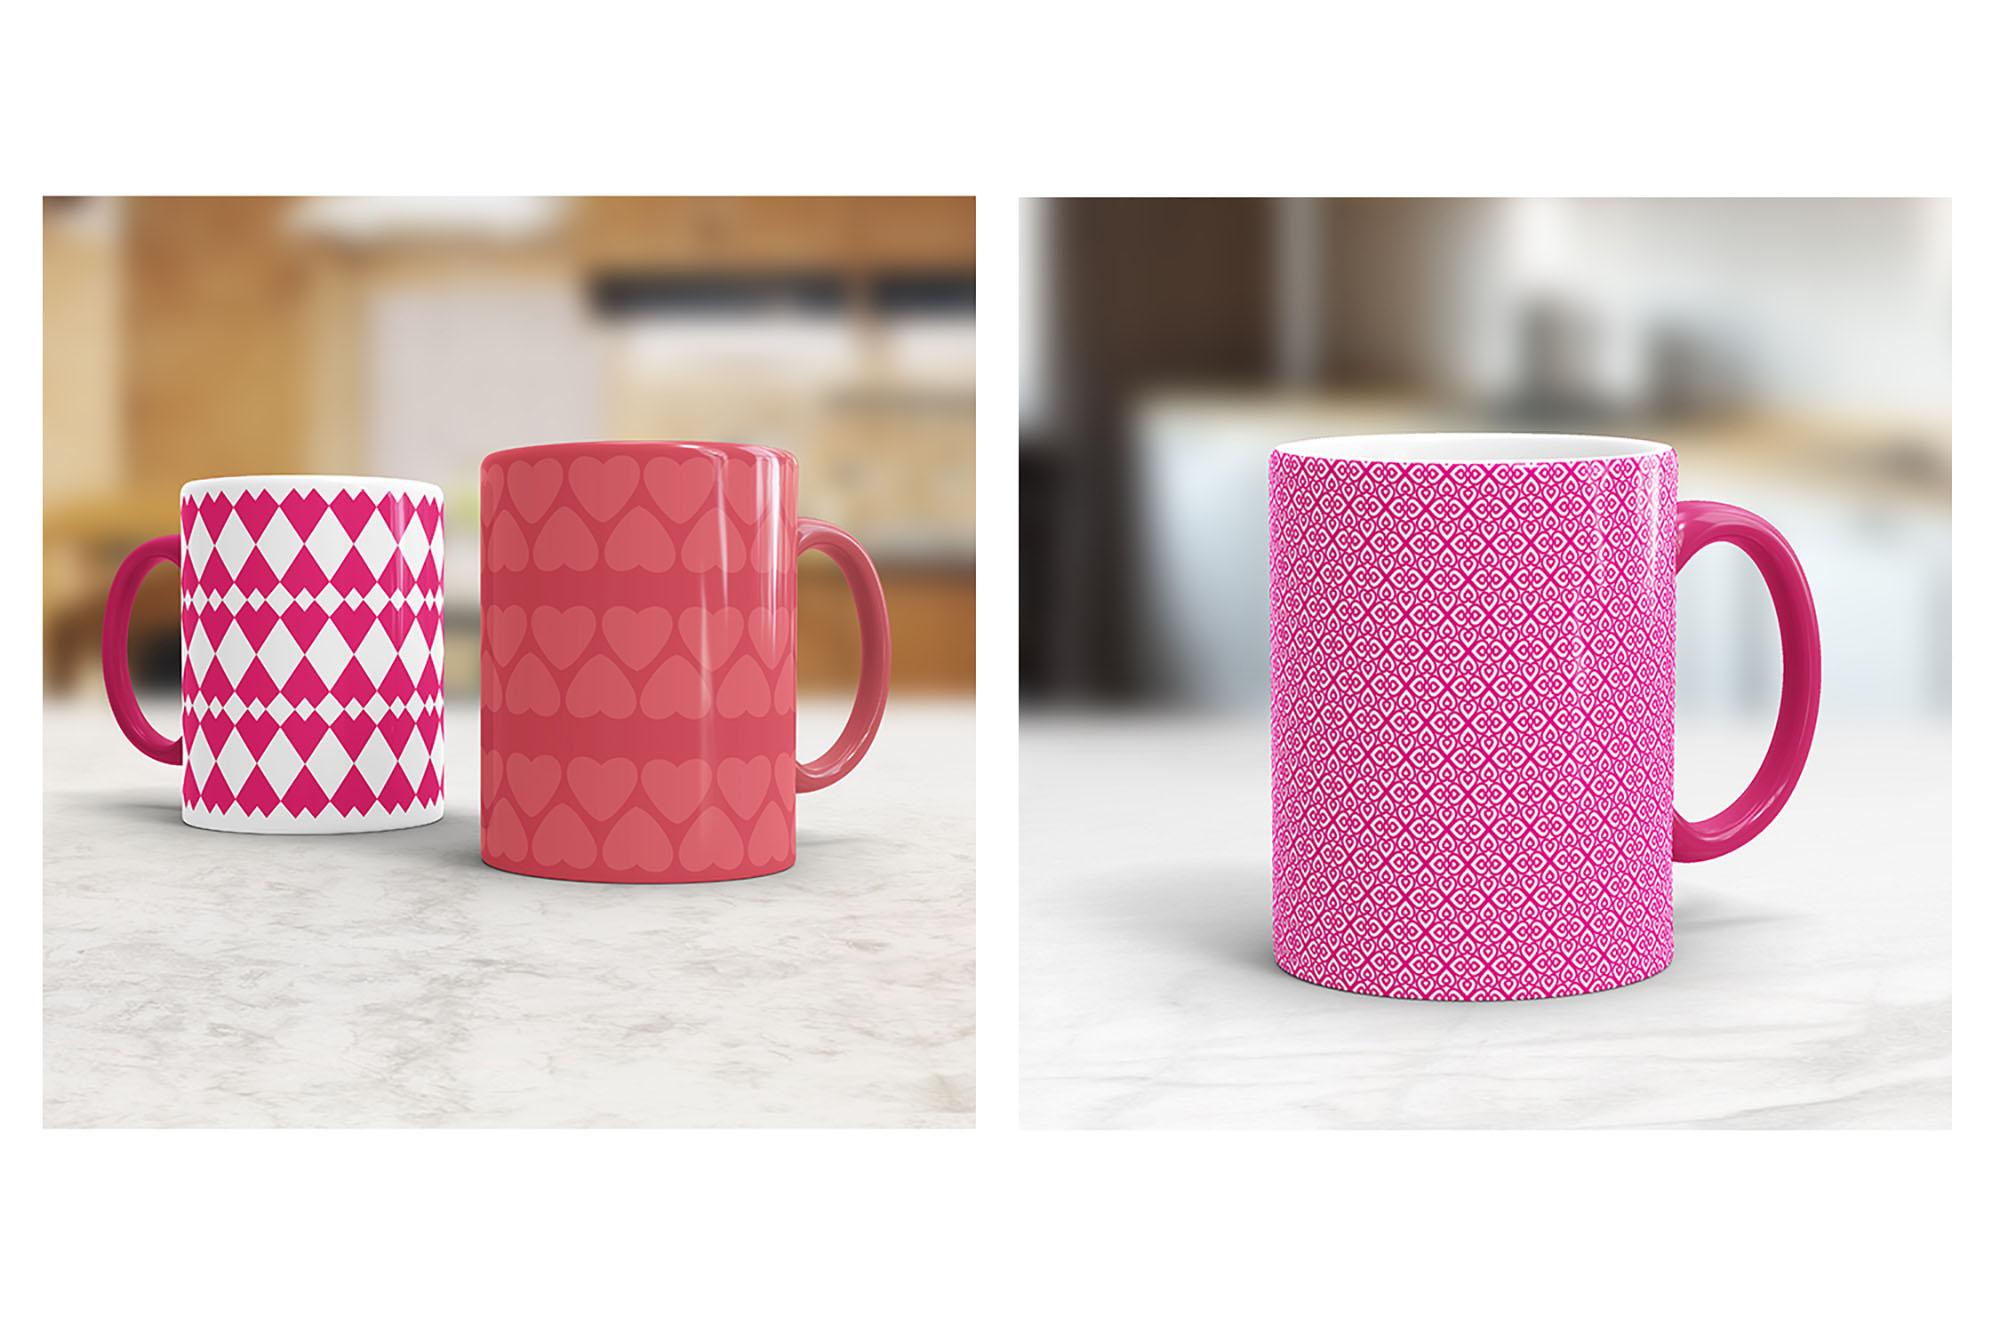 mug mockup for squarespace 2000px wide.jpg